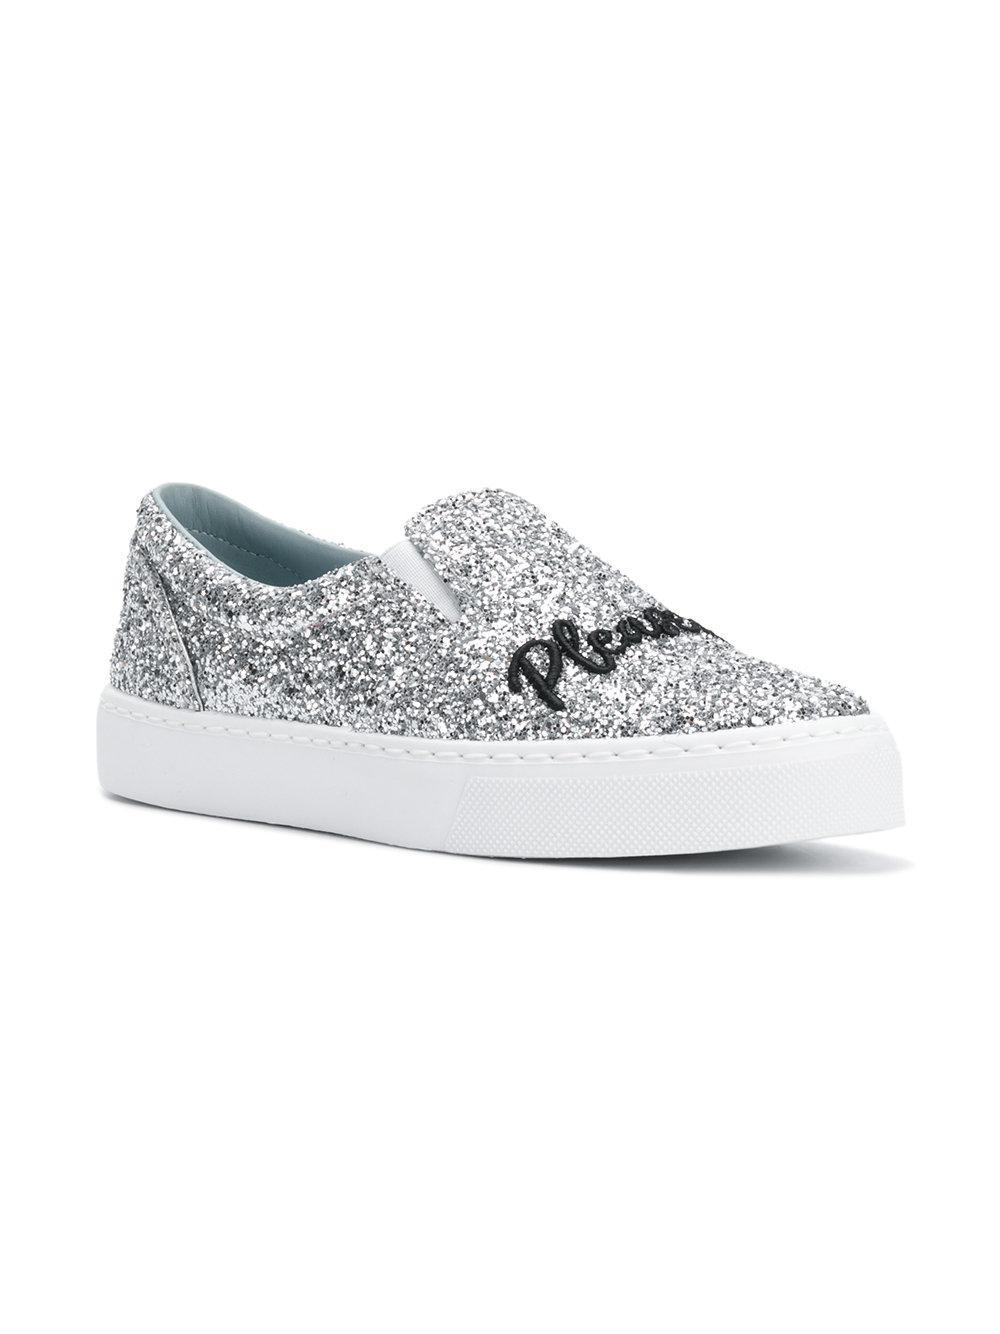 Chiara Suite sneakers - Metallic Chiara Ferragni wehWams2M6